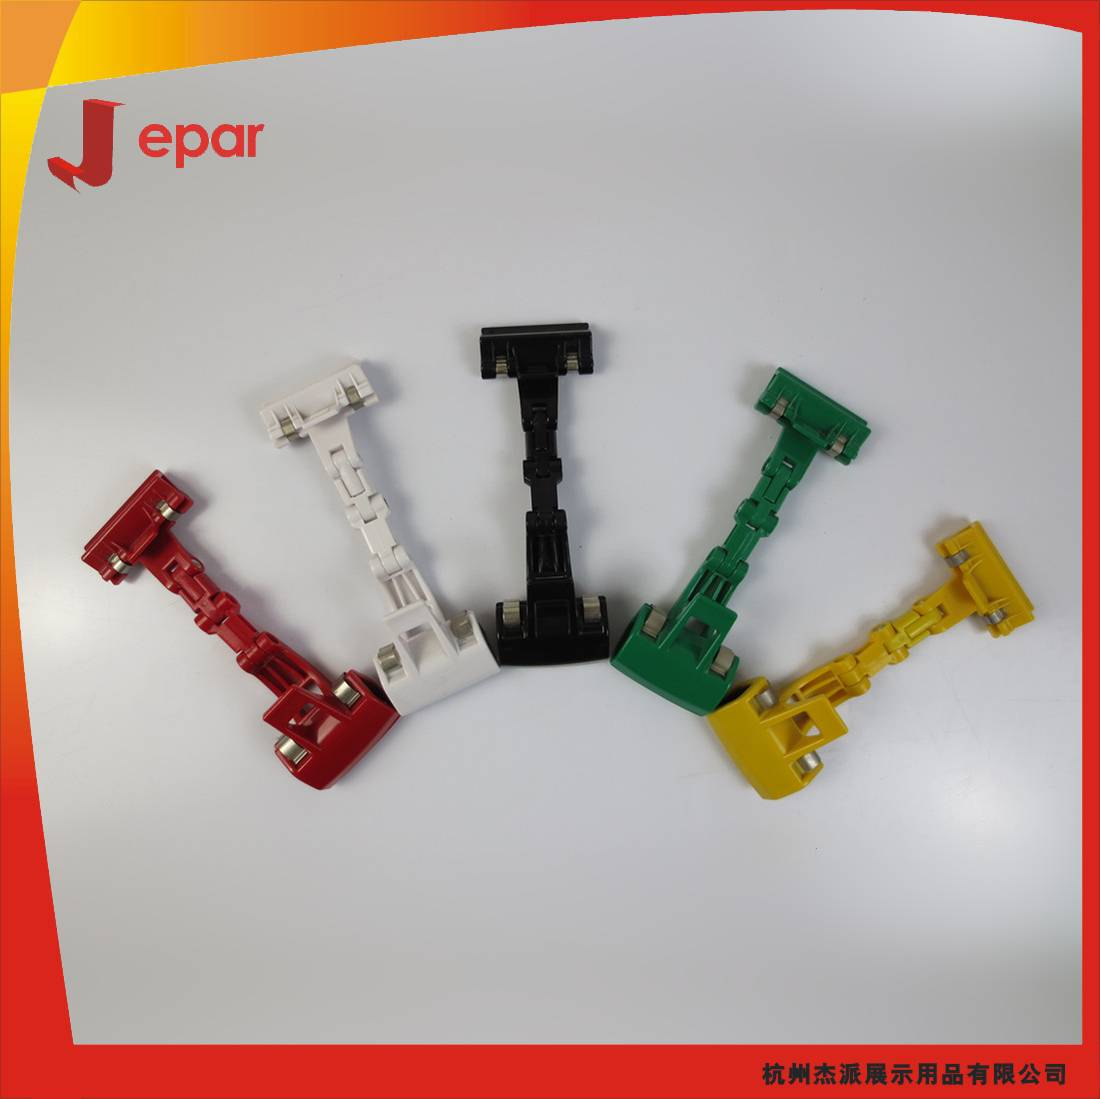 Supermarket adjustable colorful plastic holder for price display